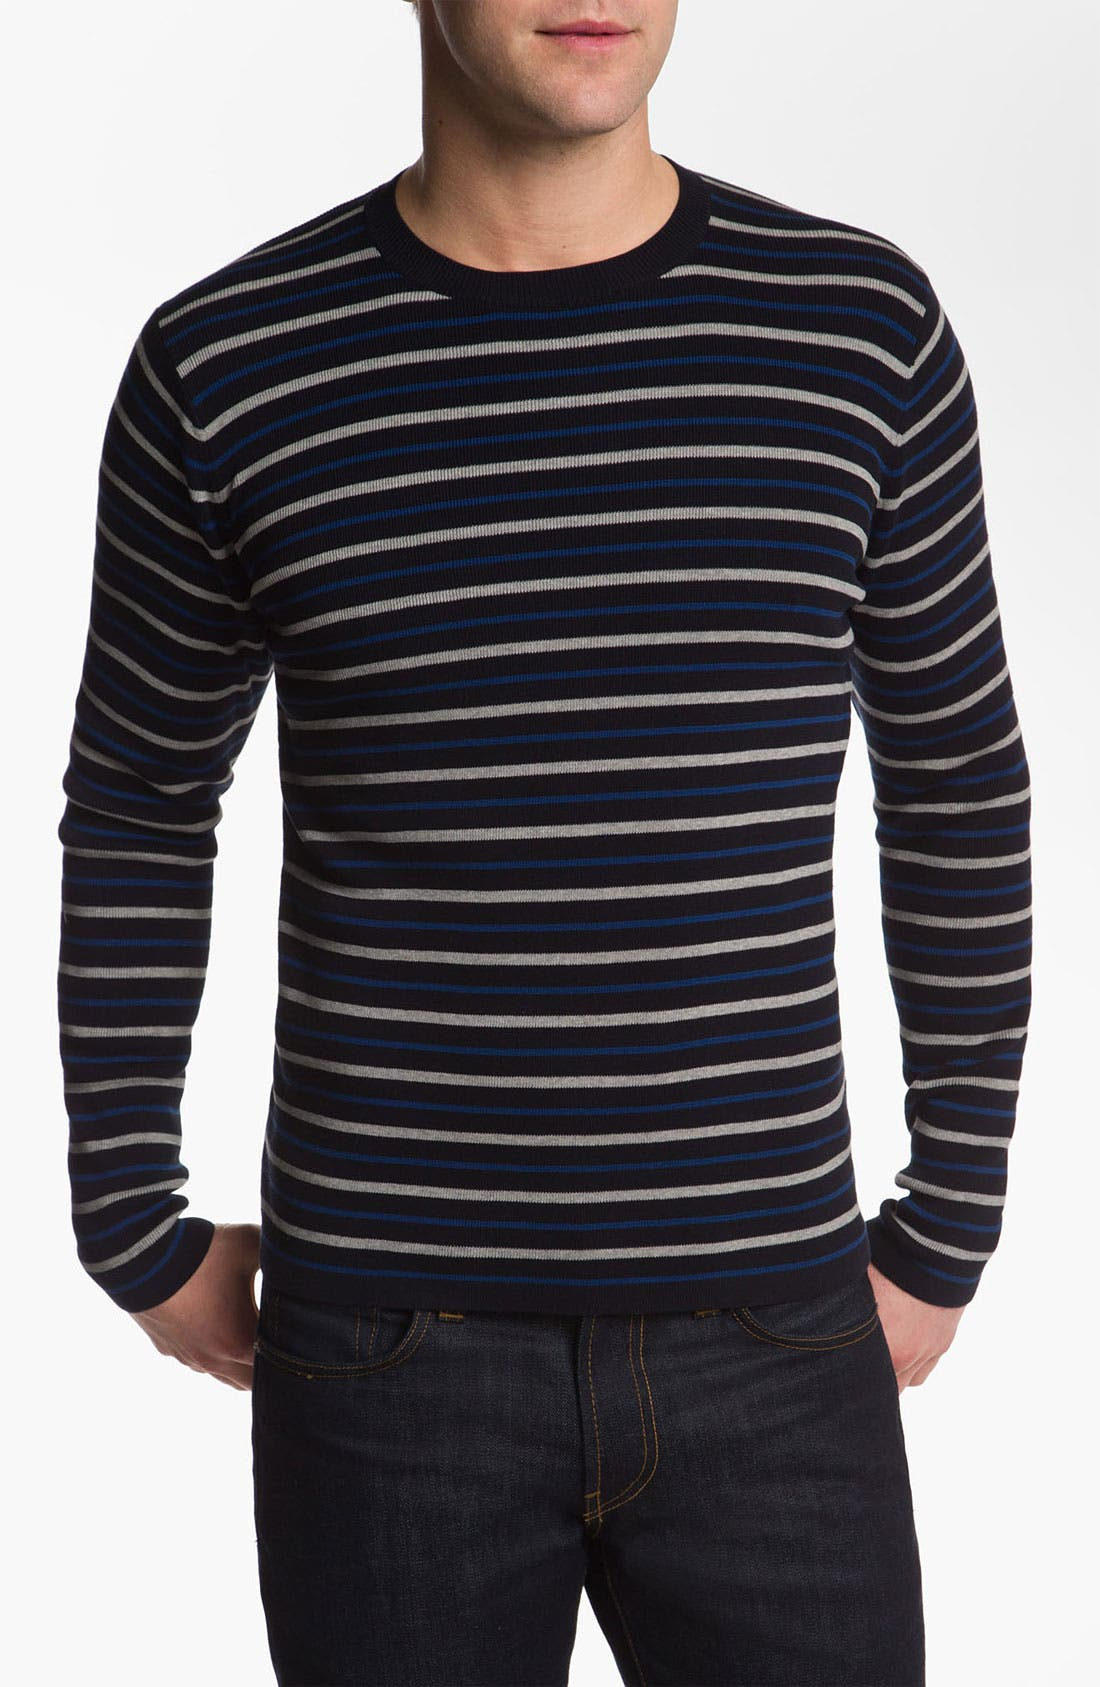 Alternate Image 1 Selected - Vince Stripe Crewneck Sweater